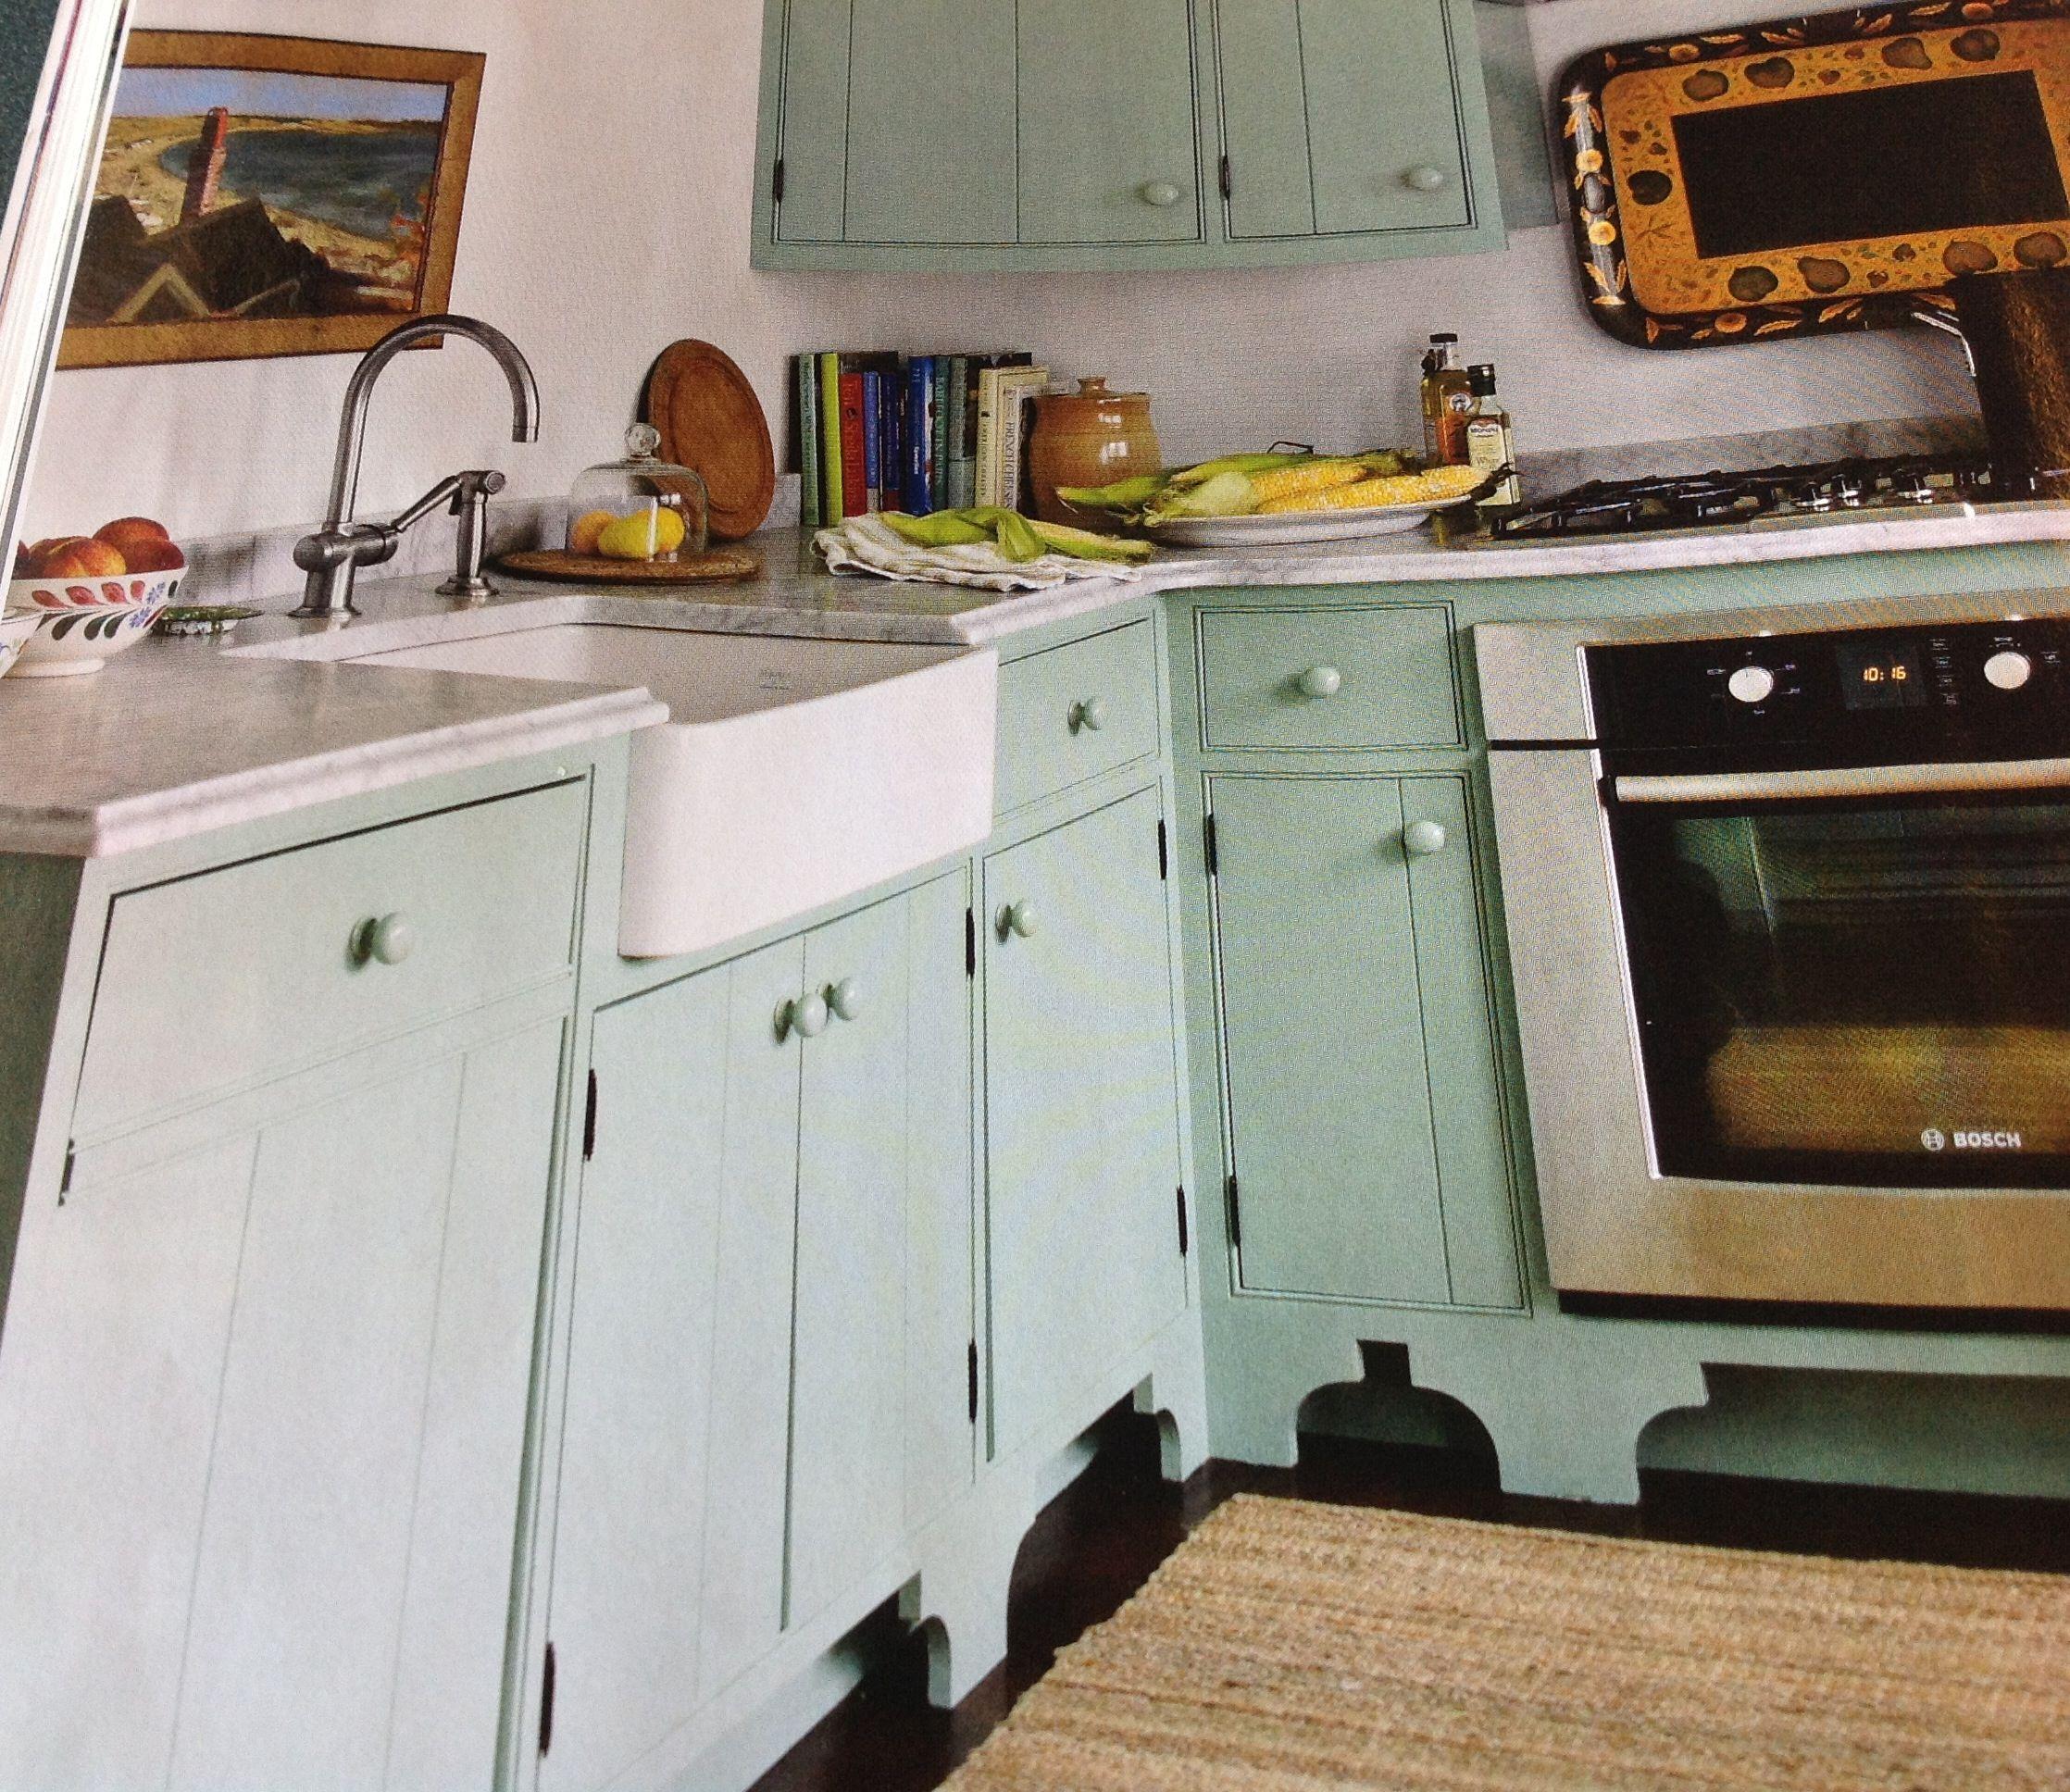 Aqua cabs | Kitchen cabinets, Home decor, Kitchen